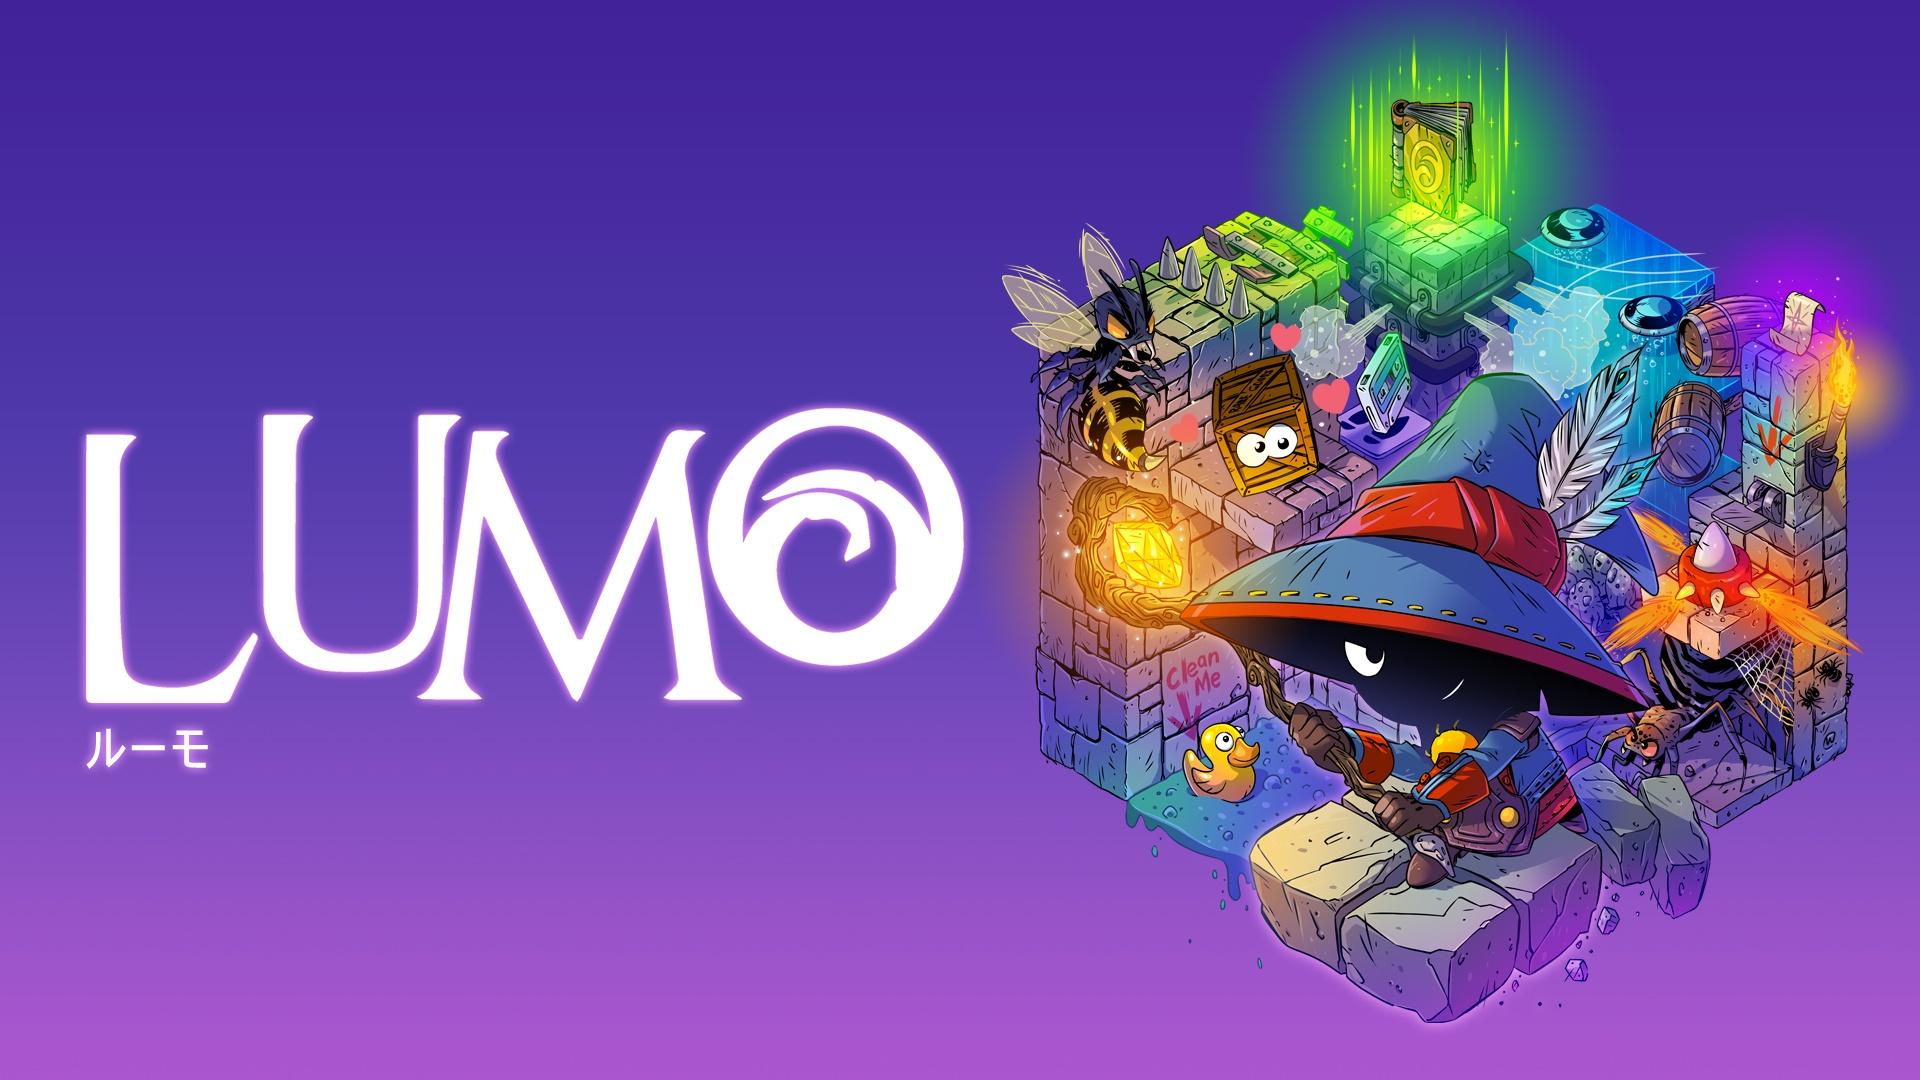 Nintendo Switch用ソフト『Lumo』の国内配信日が2017年11月16日に決定!